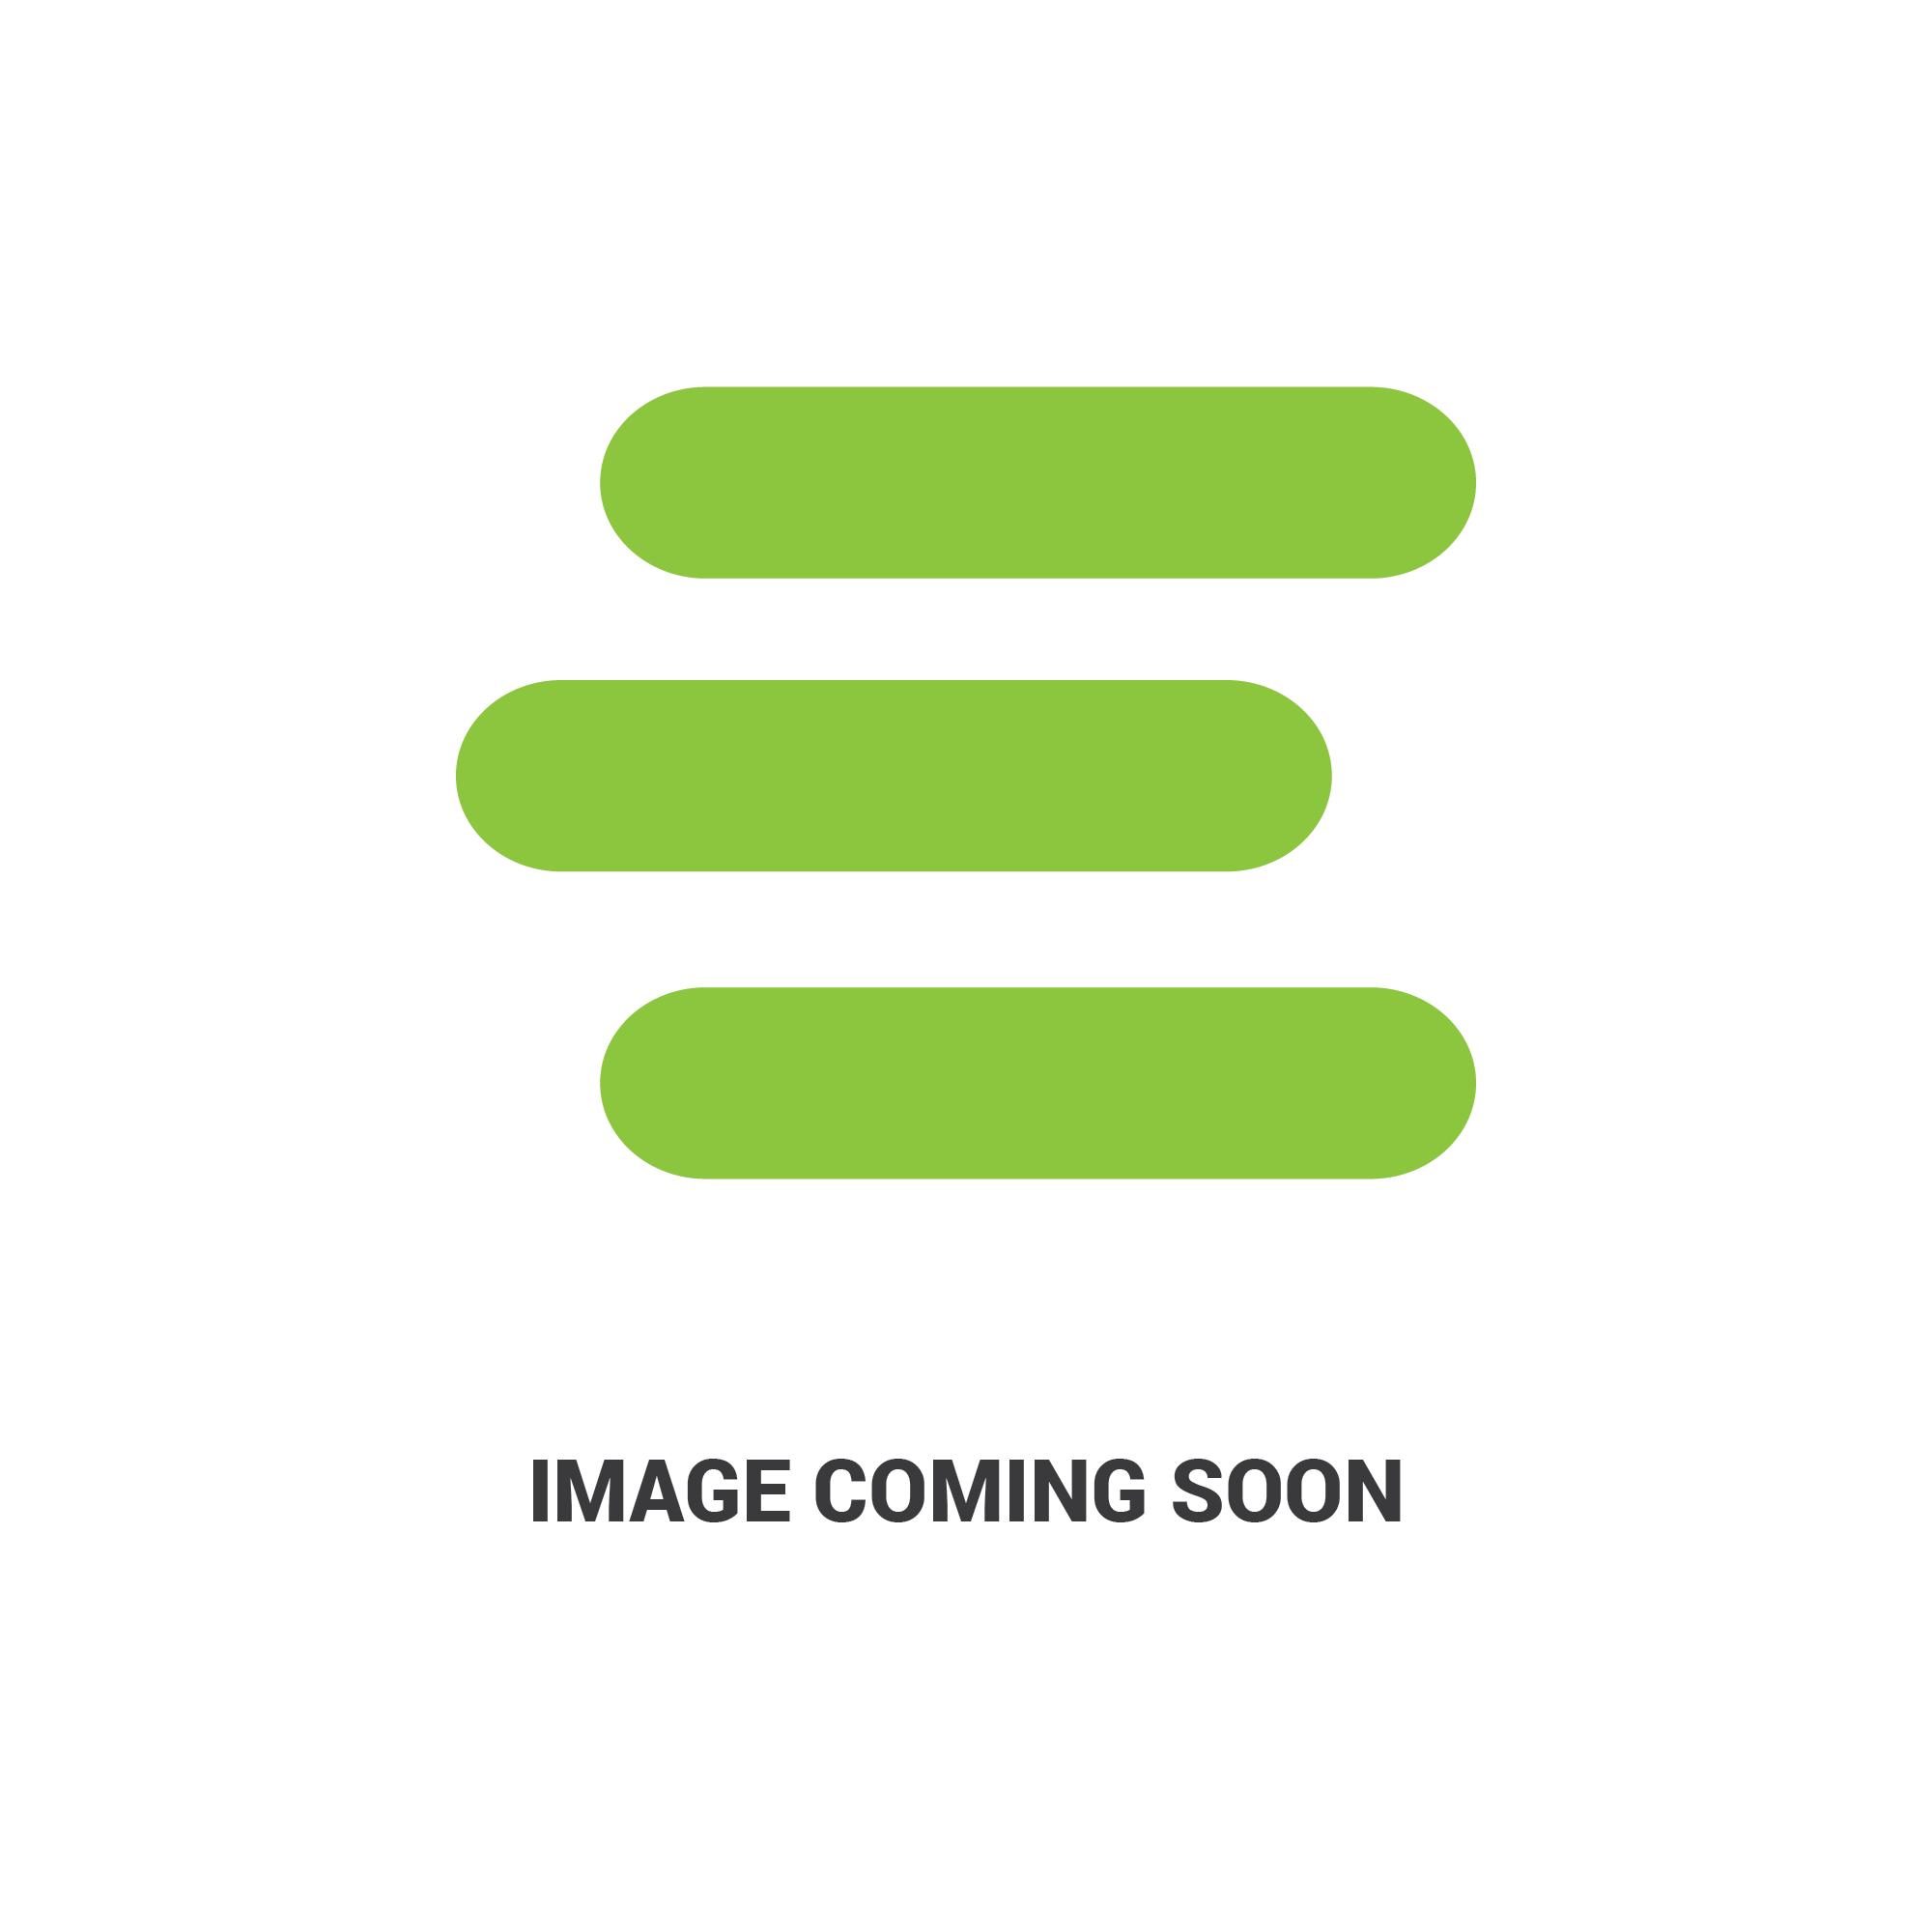 E-70000-16644edit 2.jpg